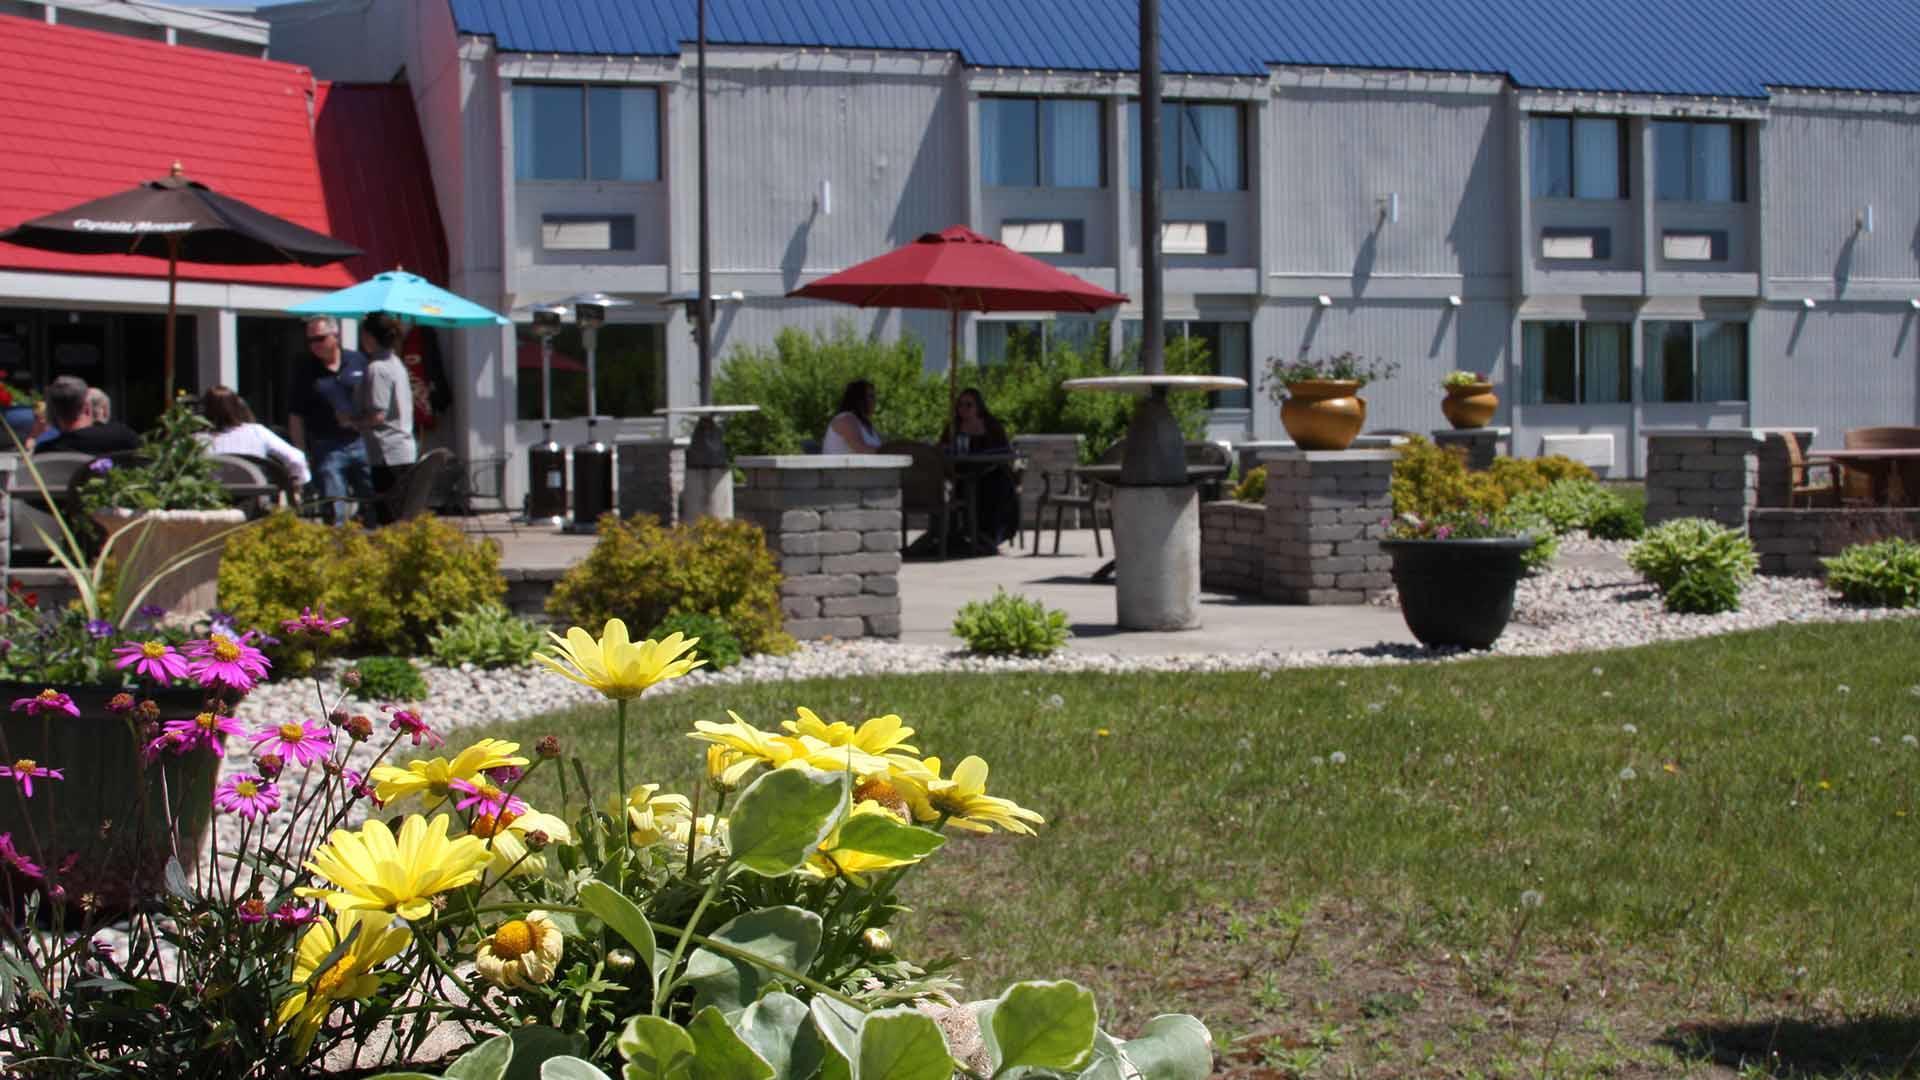 Barkers Island Inn Resort & Conference Center image 3